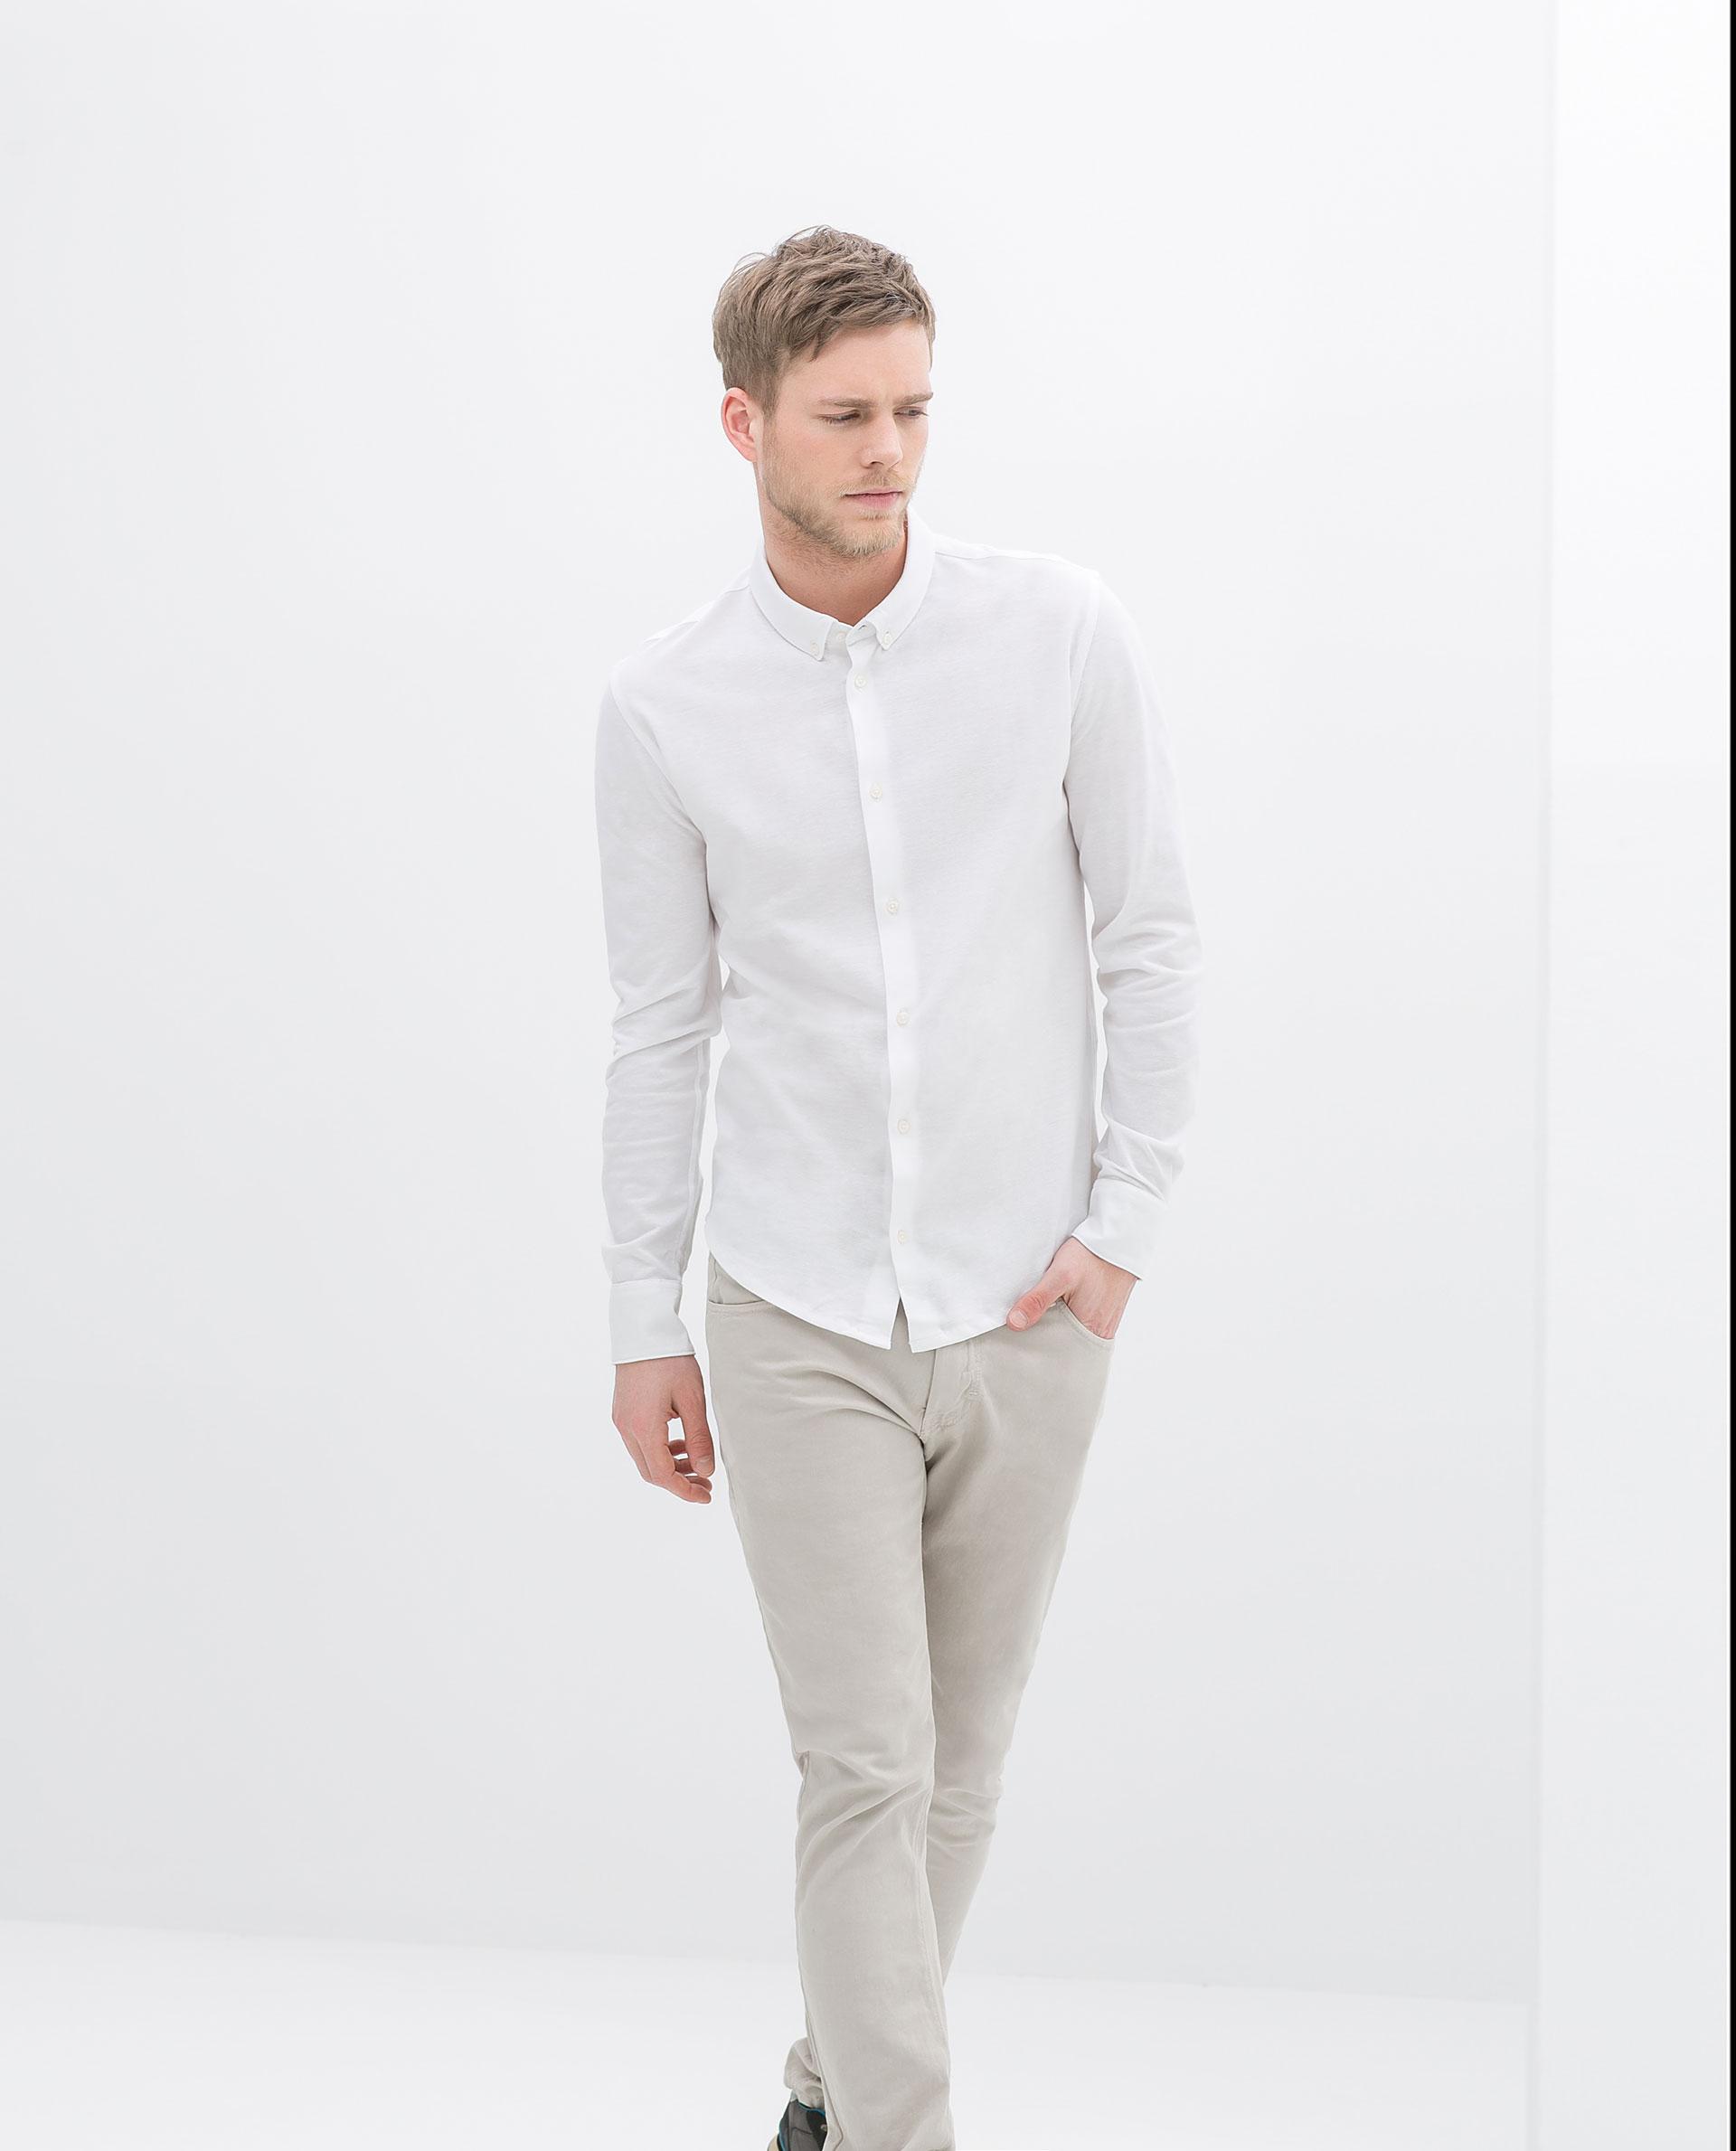 Moncler sale mens shirts zara for Zara mens shirts sale